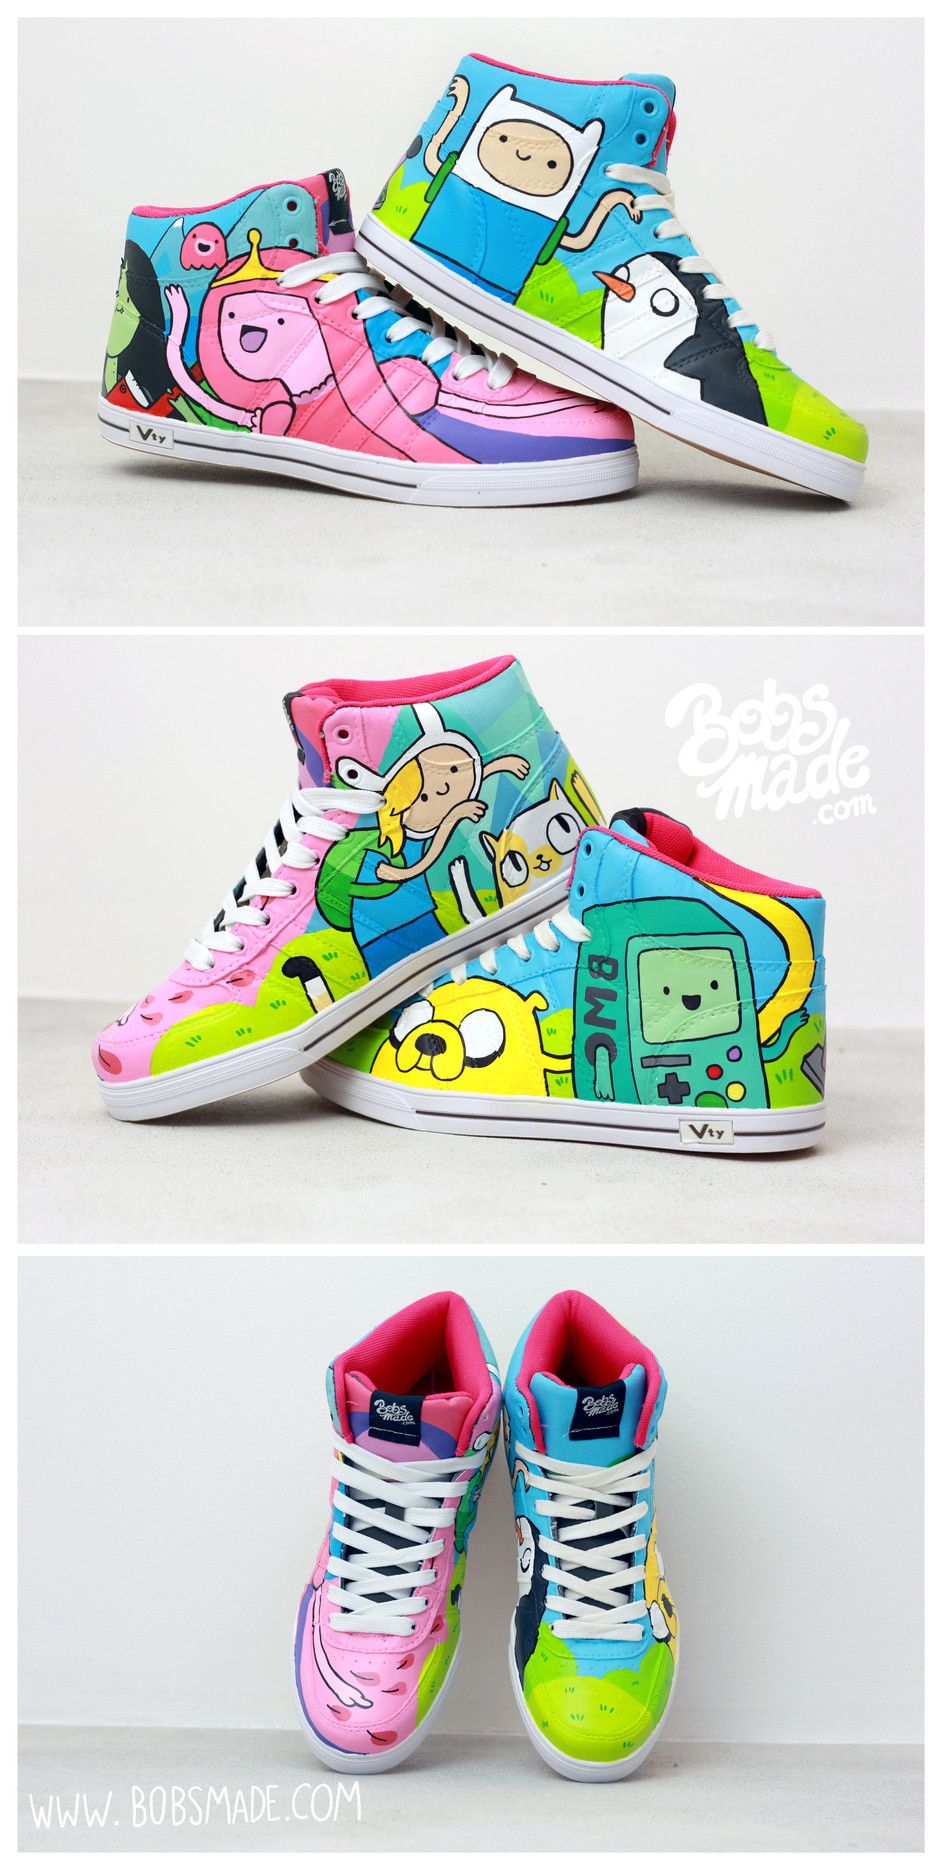 Adventure Time Sneaker by bobsmade.com